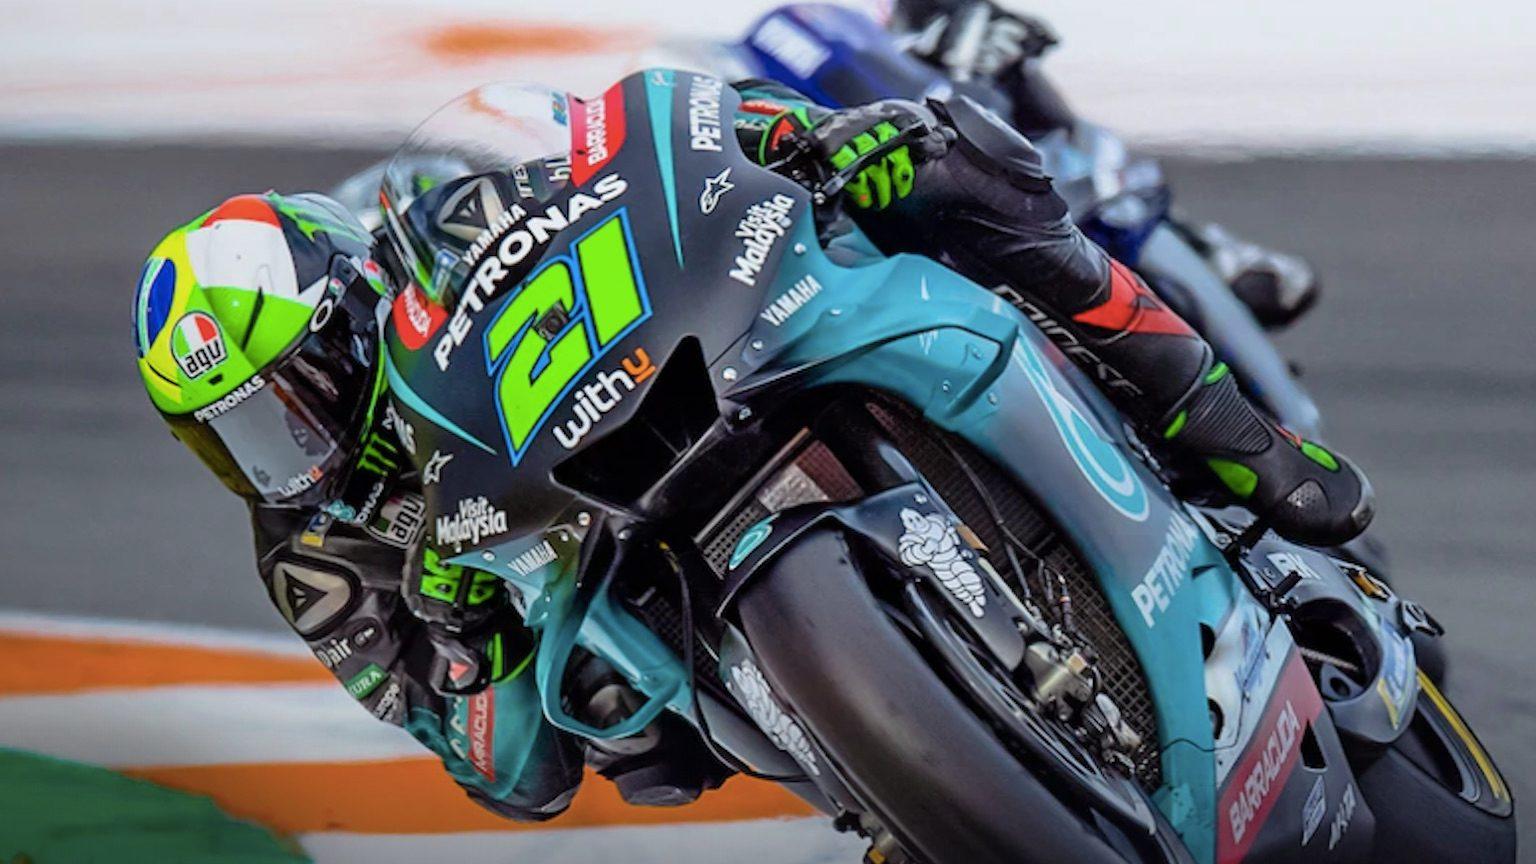 2019 MotoGP, Moto2 and Moto3 Championships